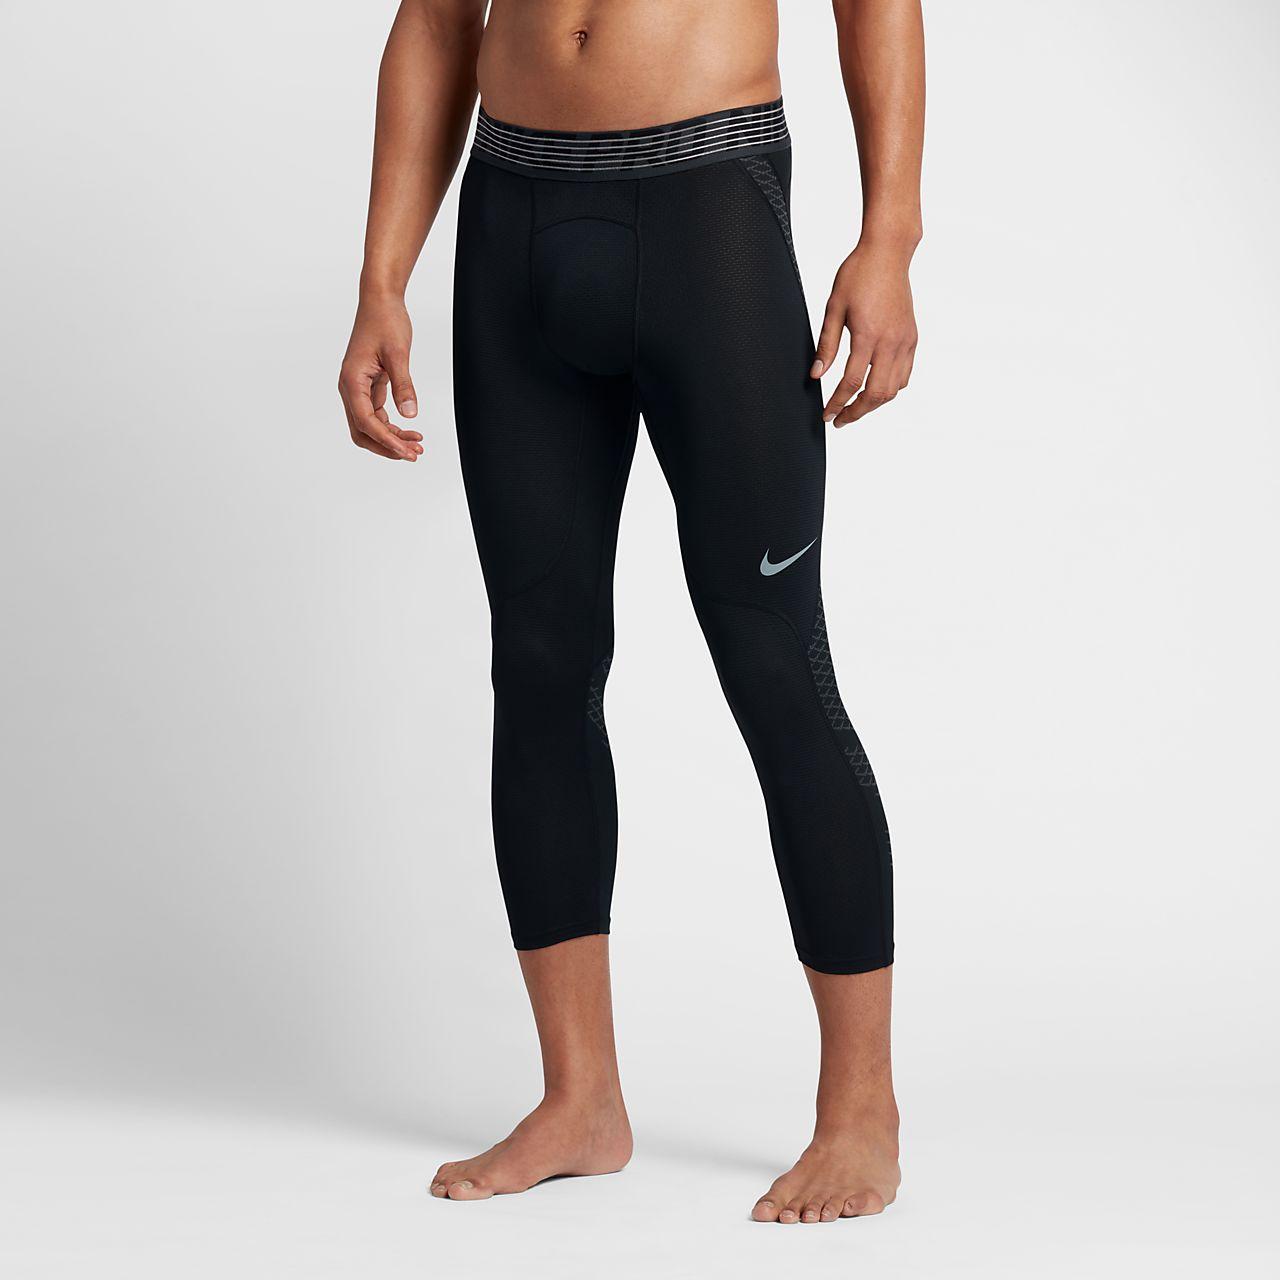 ... Nike Pro HyperCool Men's 3/4 Training Tights